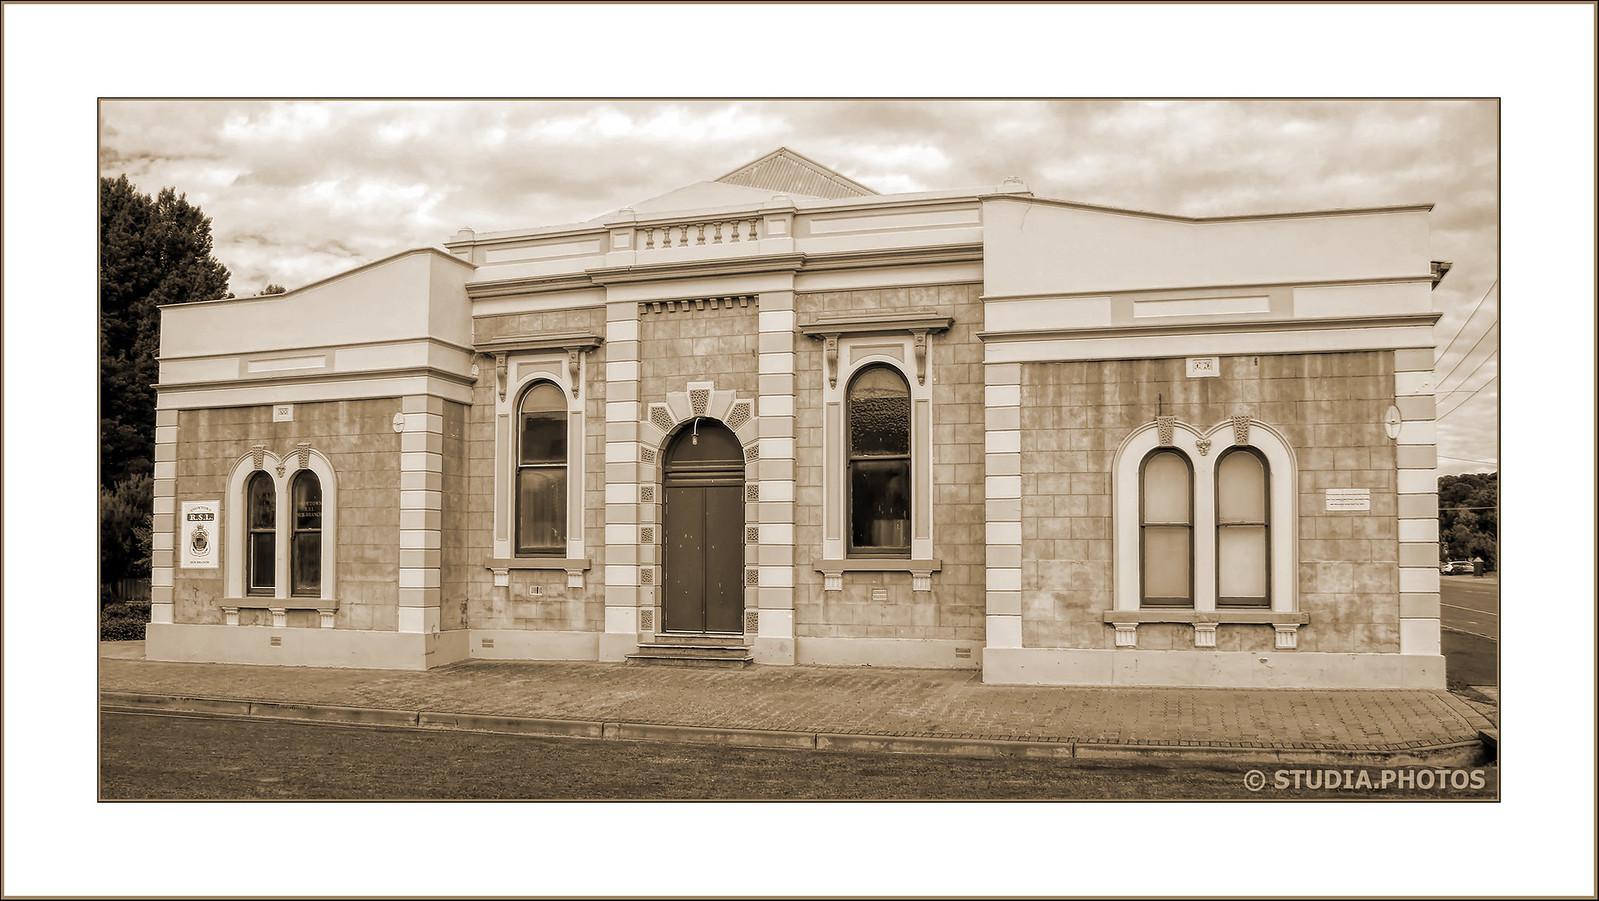 Soldiers Memorial Hall, Cnr Railway Terrace East & Fourth Street, Snowtown, South Australia c.1924